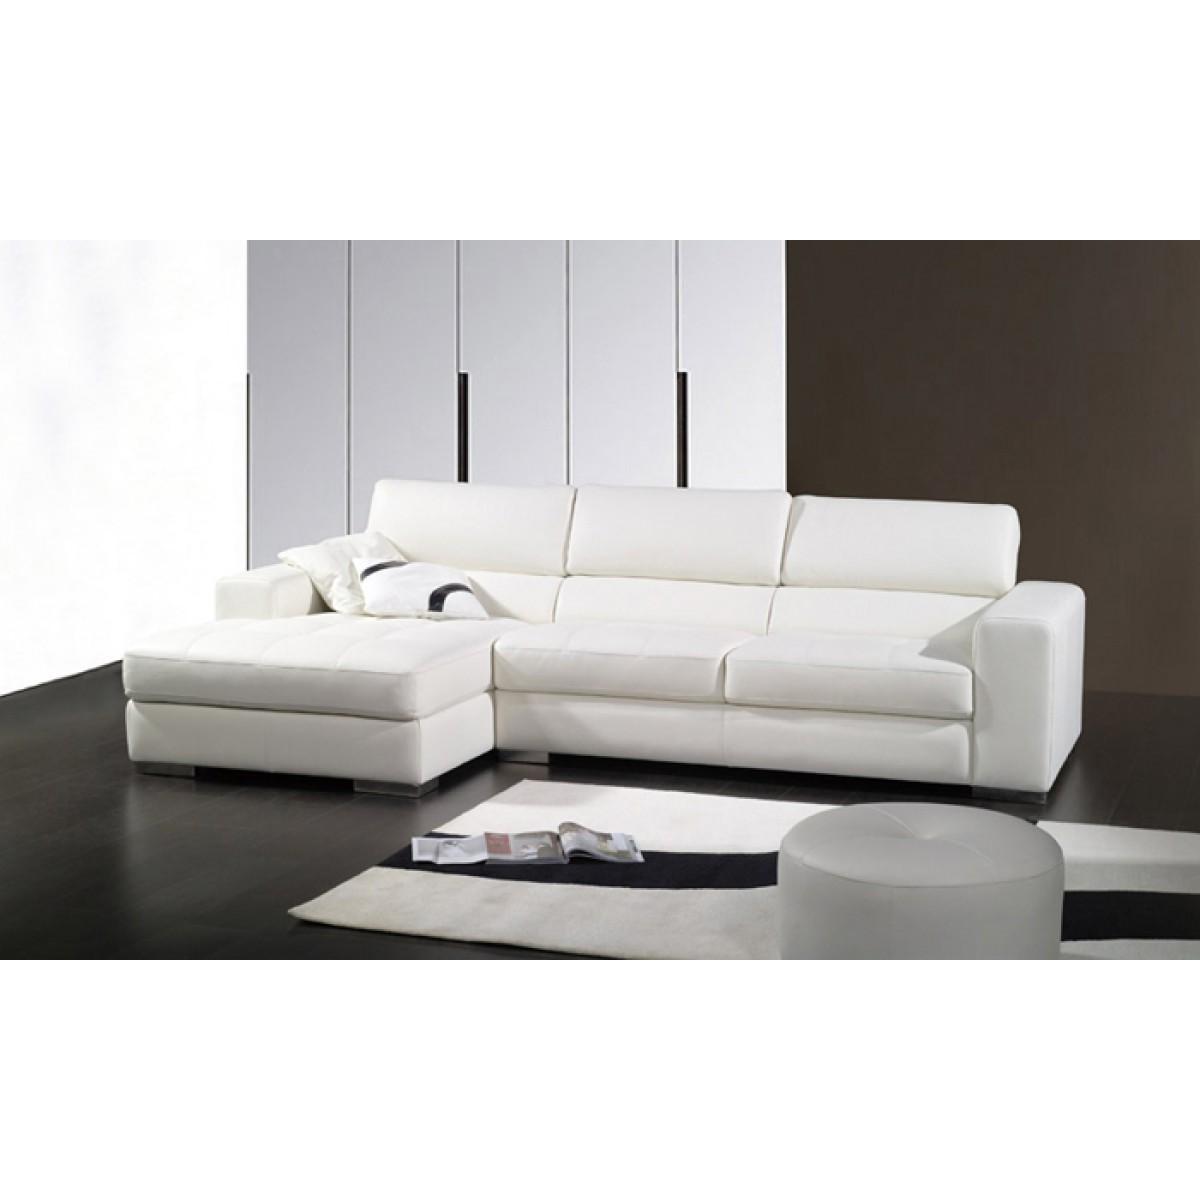 canap d 39 angle en cuir pleine fleur valence pop. Black Bedroom Furniture Sets. Home Design Ideas